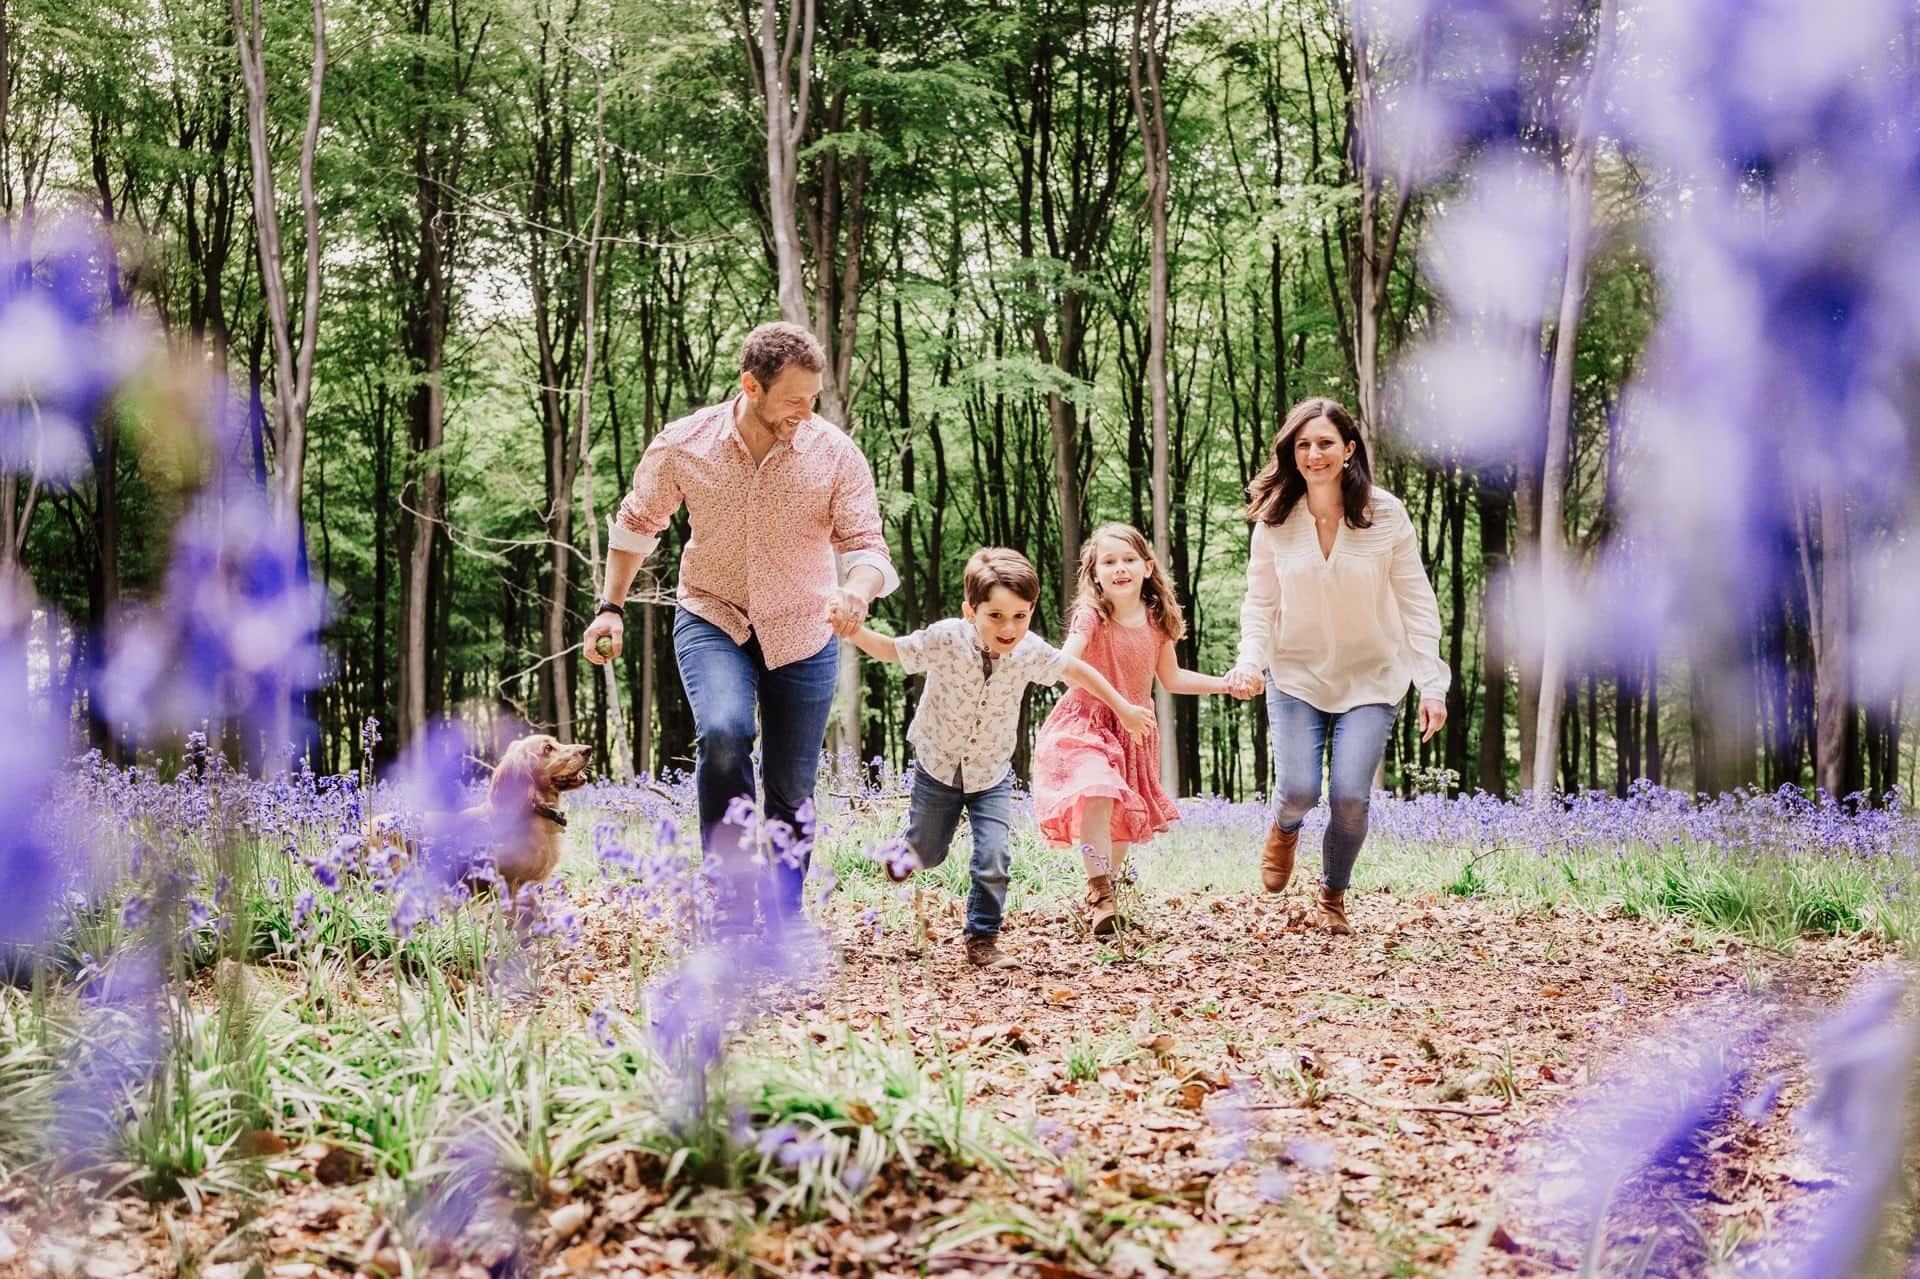 Family Bluebell Photographer Basingstoke Hampshire – The English Family